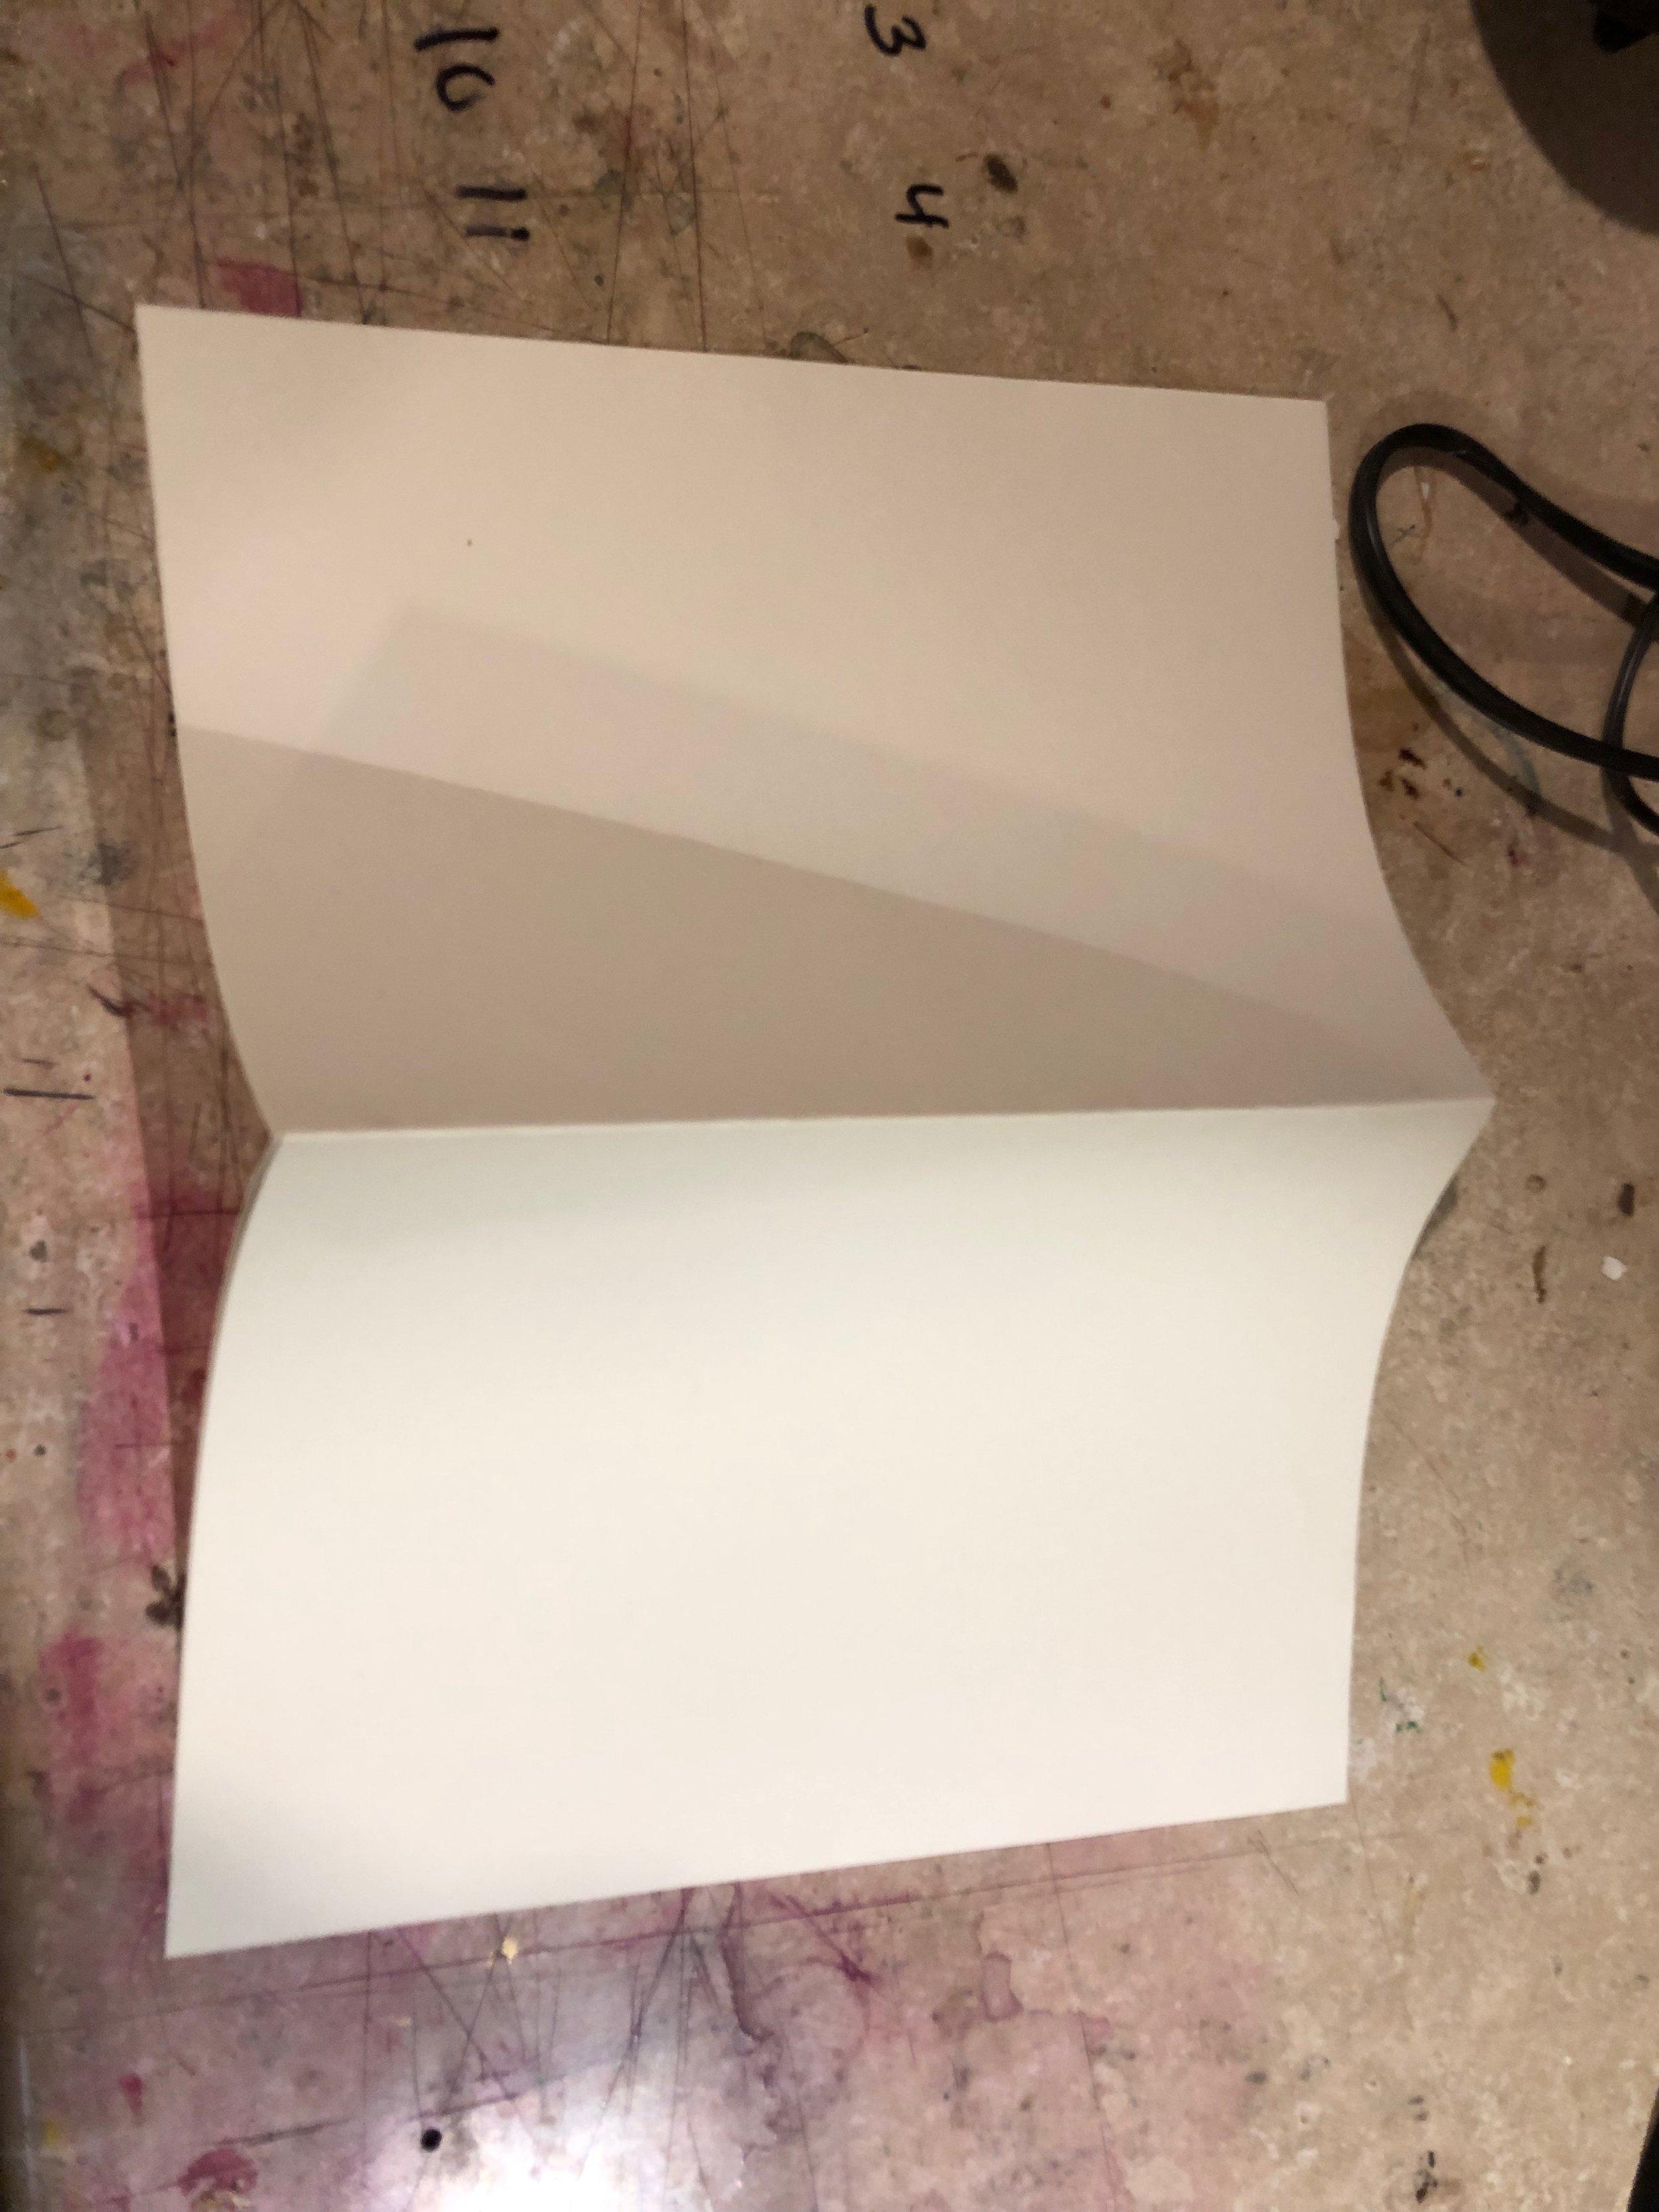 Preparing each page